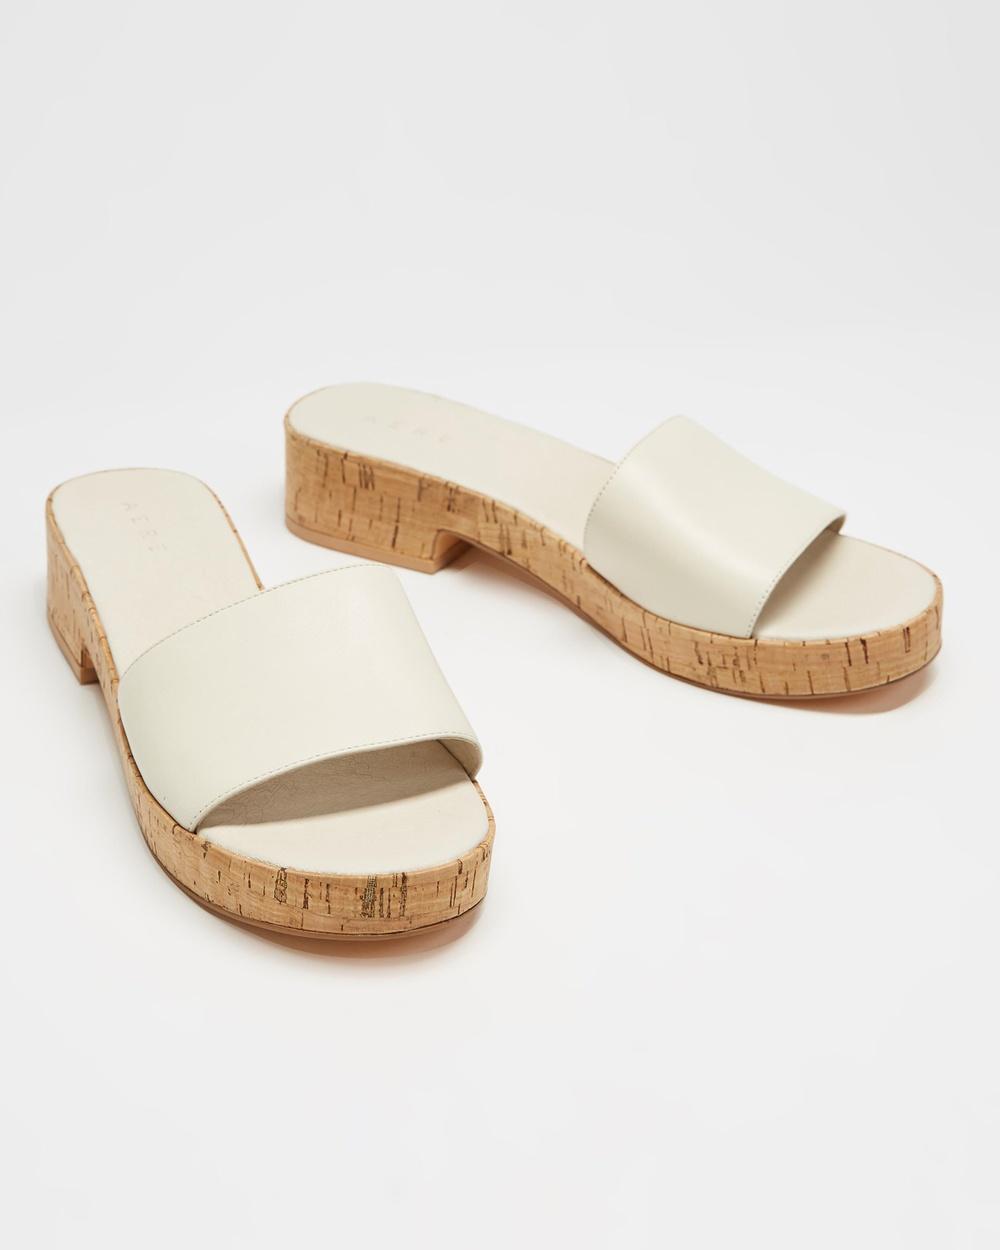 AERE Leather Single Strap Cork Mules Sandals Cream Leather